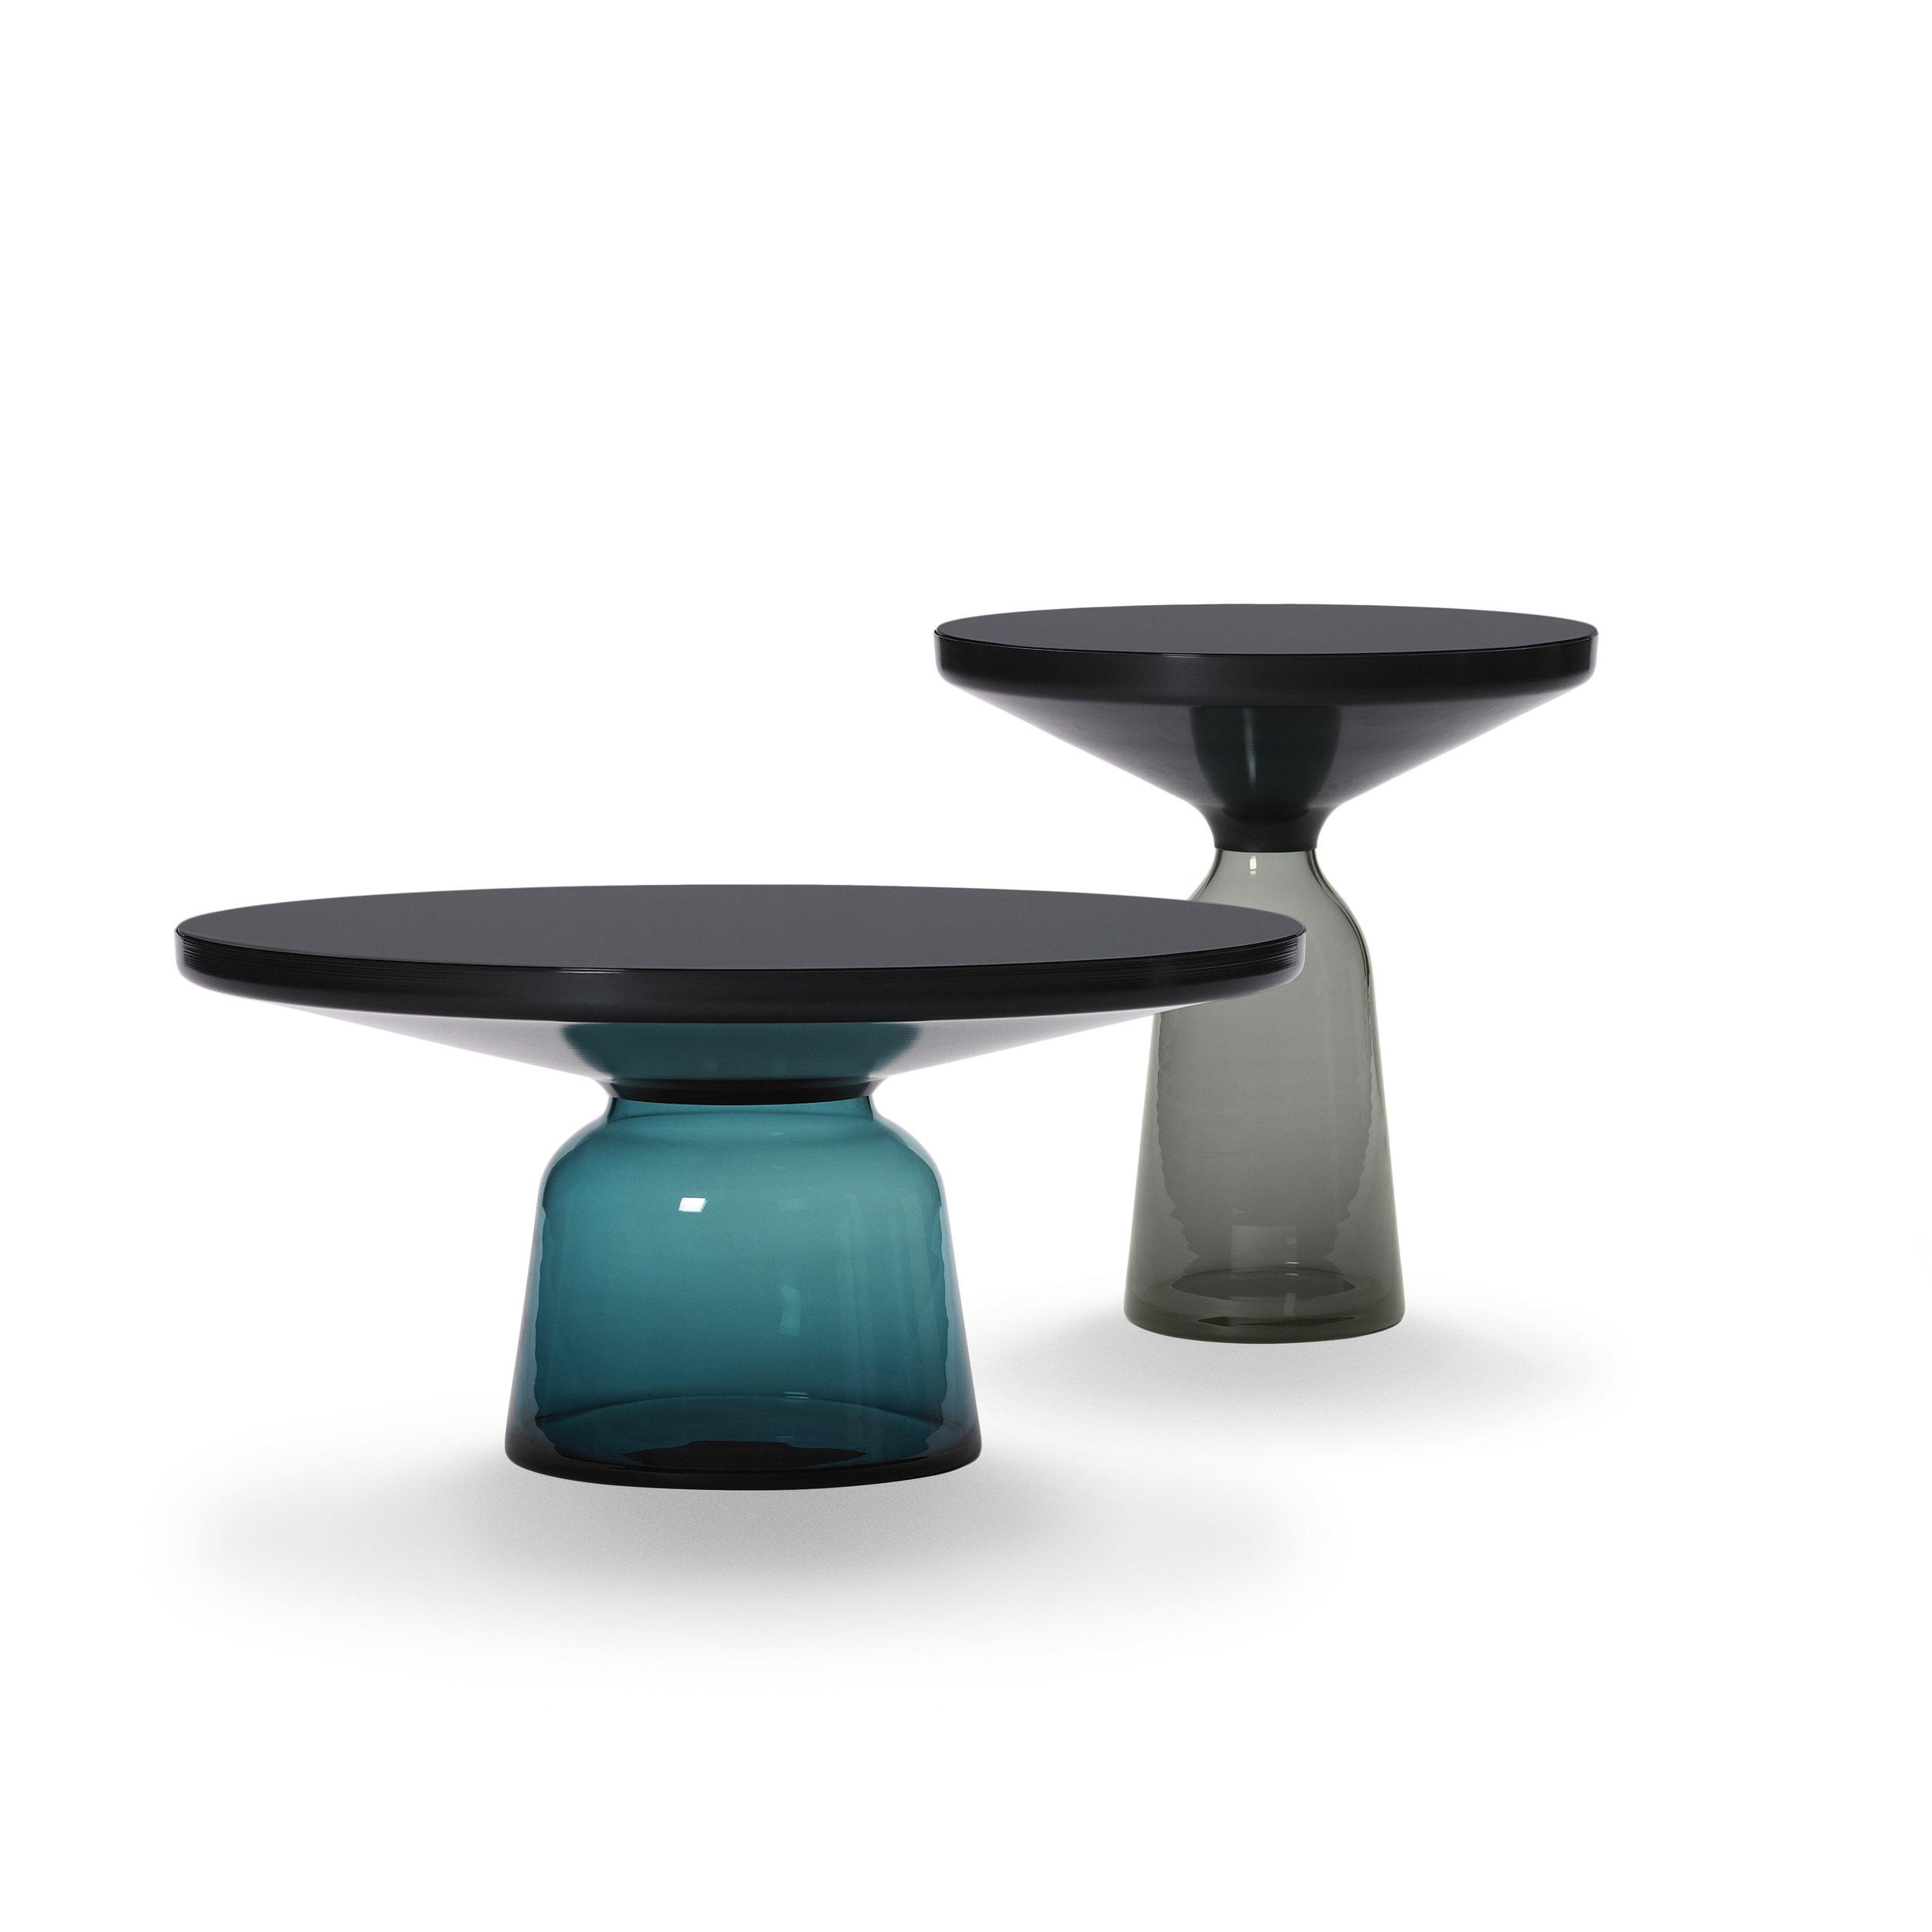 bell-coffee-table-black-blue-bell-side-table-black-grey.jpg